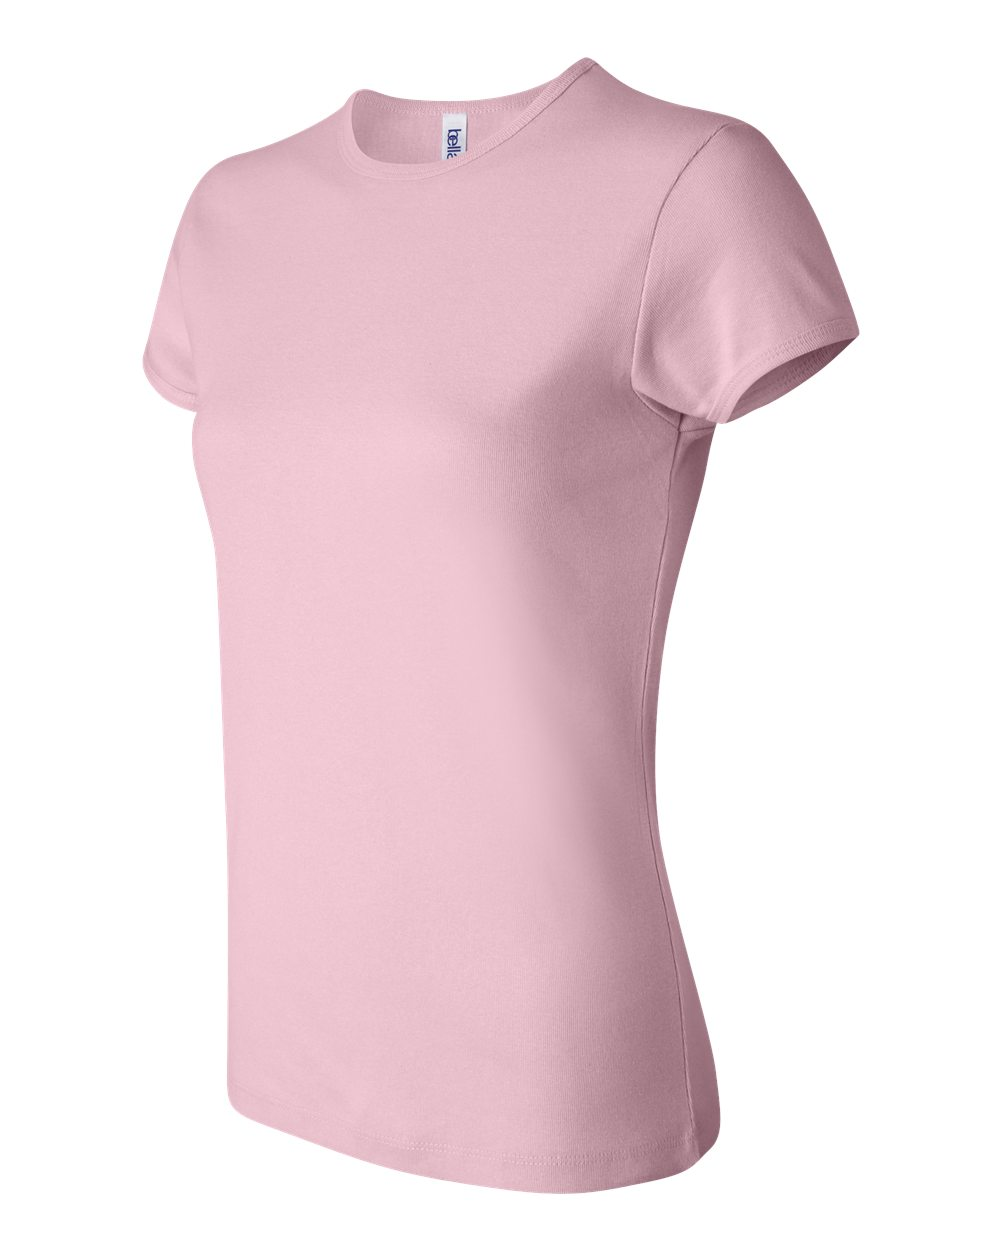 Bella 1001 Soft Pink